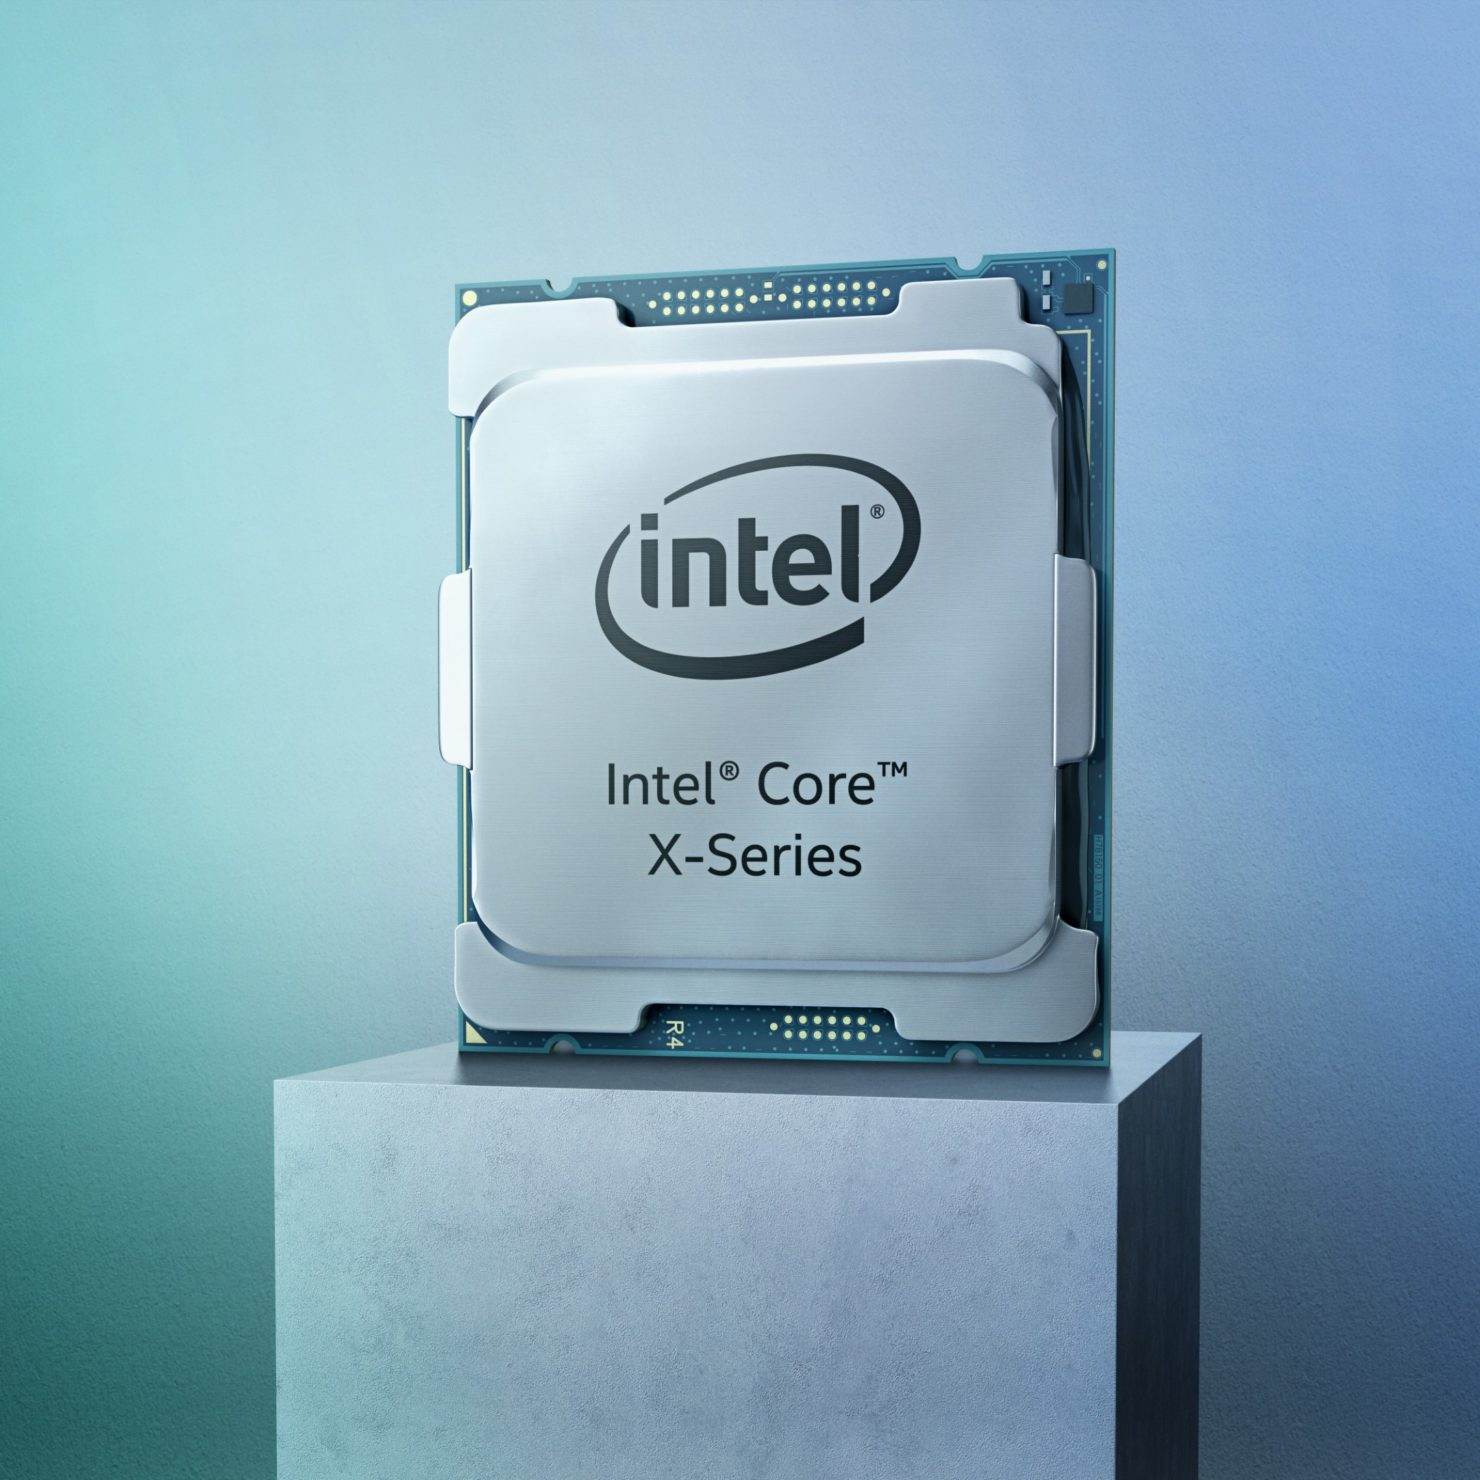 Intel-Core-X-Series-2-Custom-1480x1480.jpg